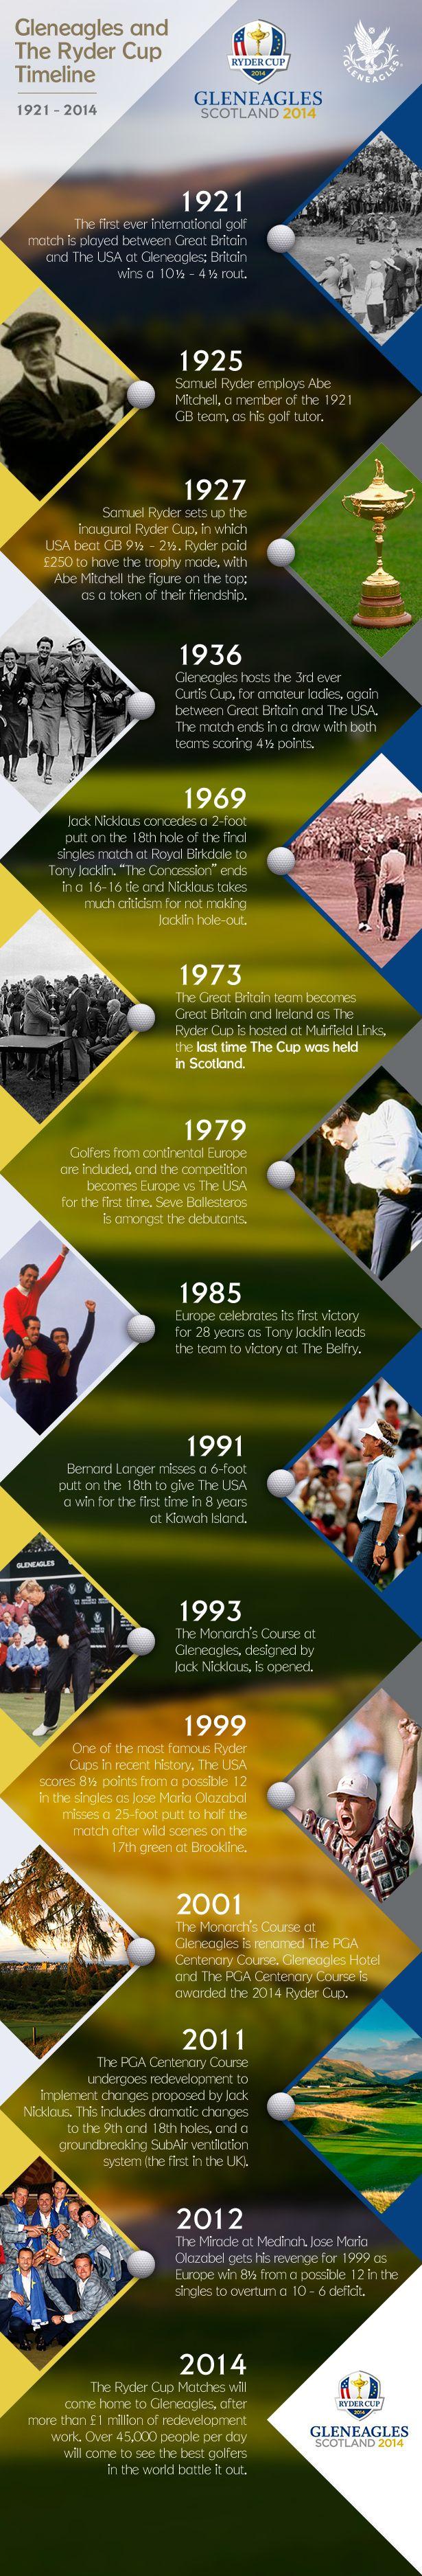 Gleneagles Golf Resort: http://www.simplyhoteljobs.com/recruiters/gleneagles-hotel-resort